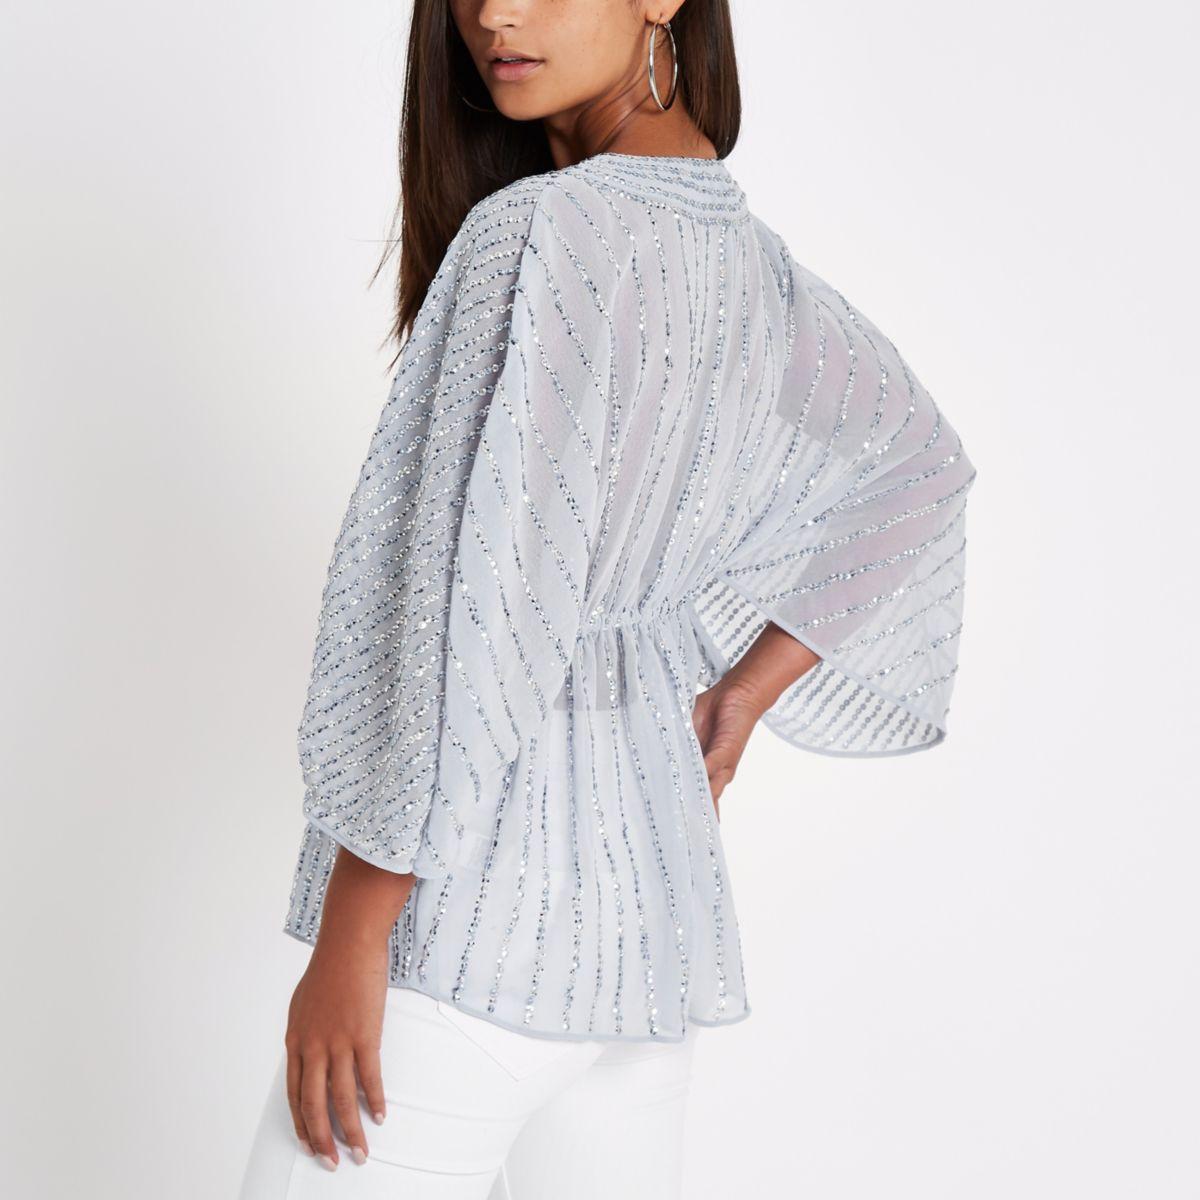 sequin Petite blue embellished top kimono qSnH1Tw4